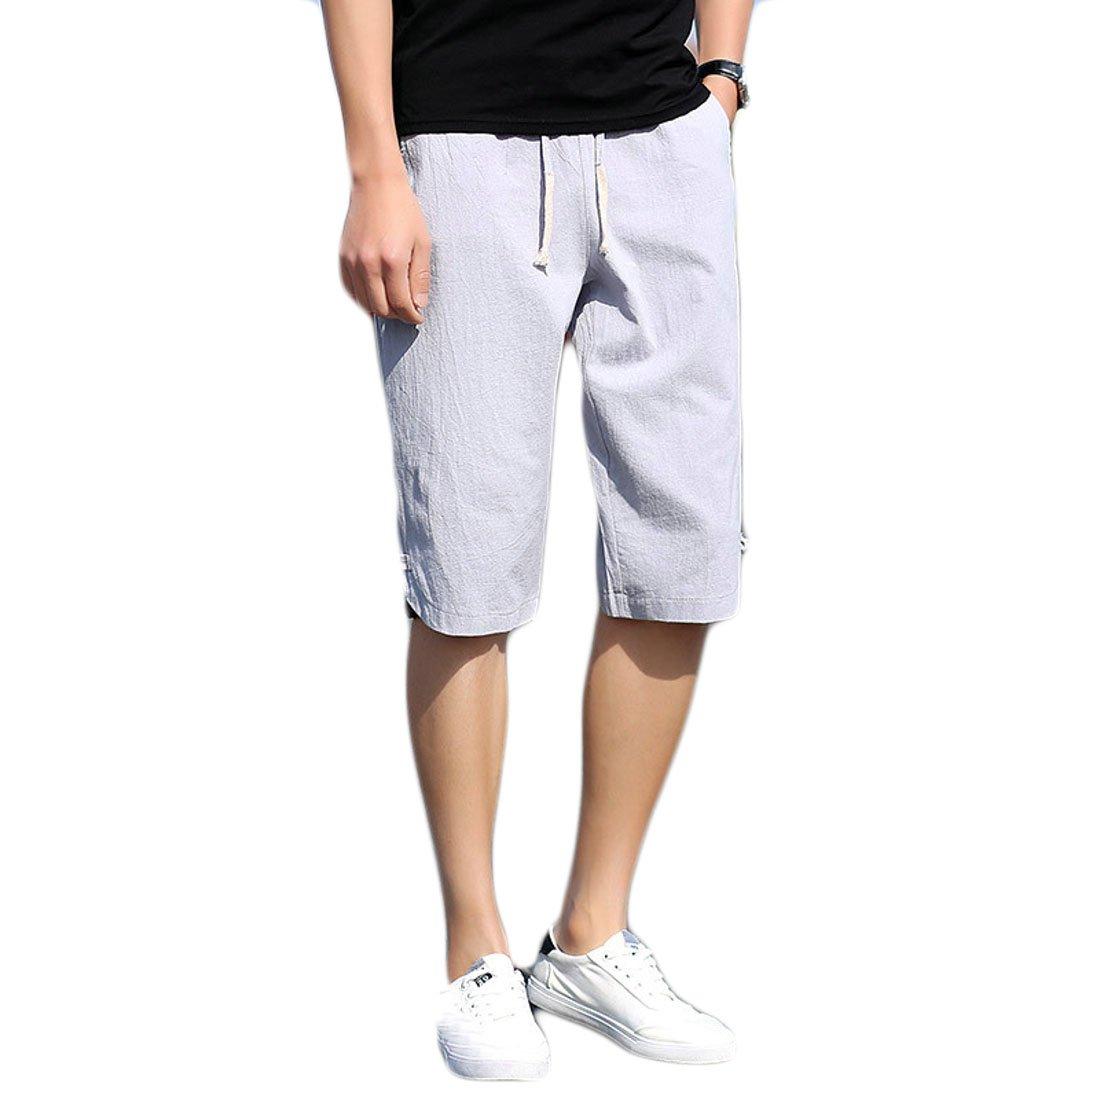 Fensajomon Men Summer Ventilation Casual Cropped Pants Cotton Linen Beach Shorts Boardshort Swim Trunk